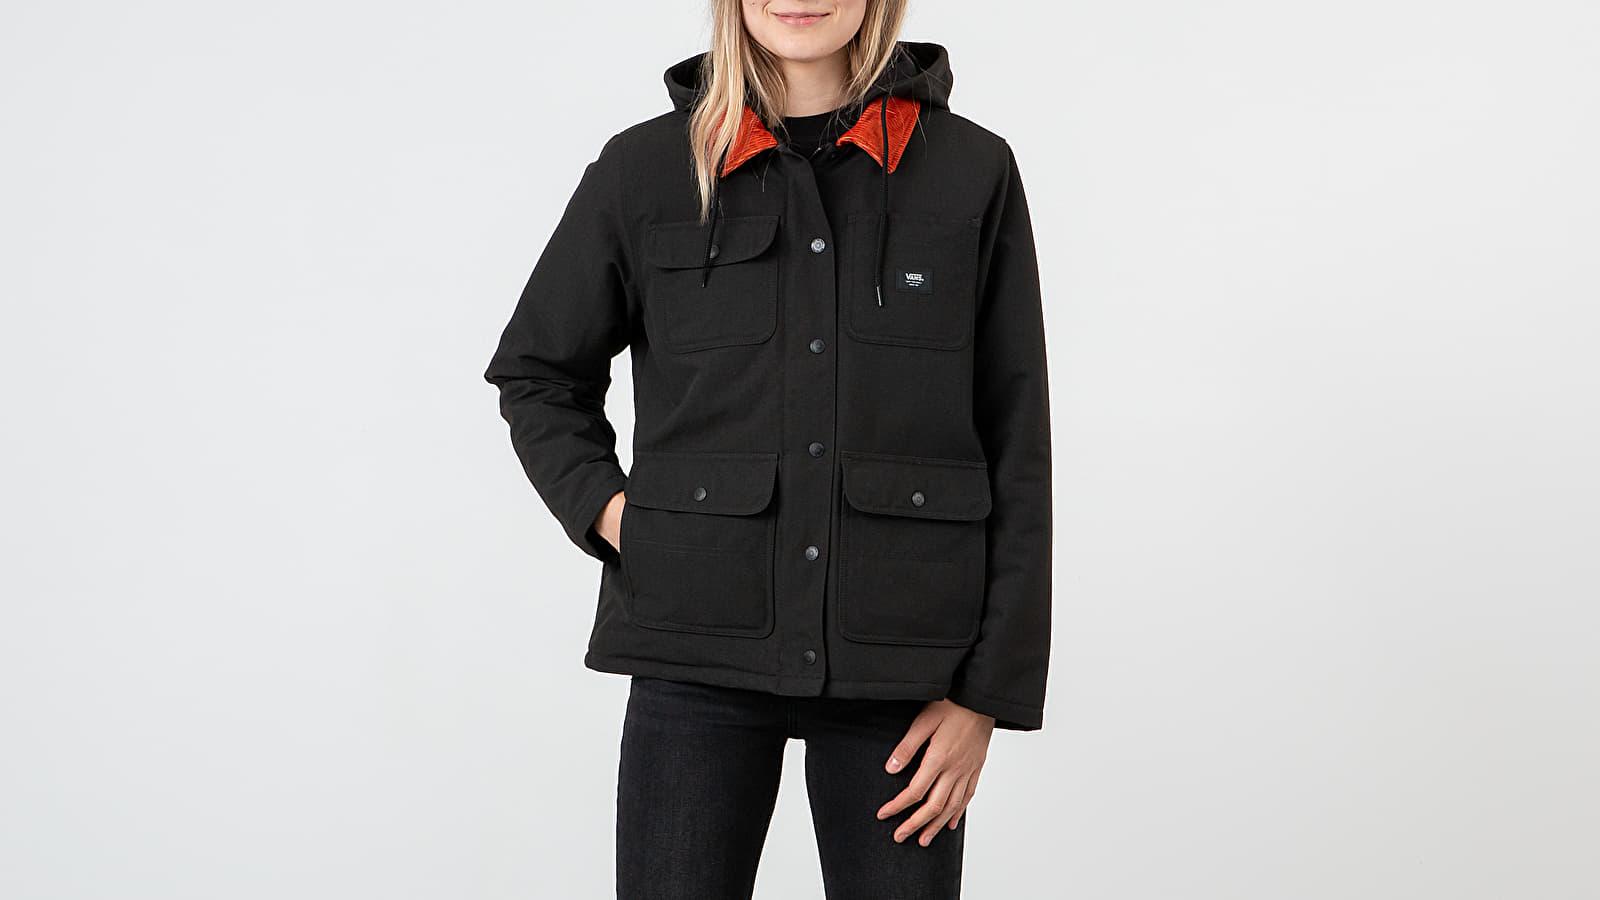 Vans Drill Chore Jacket